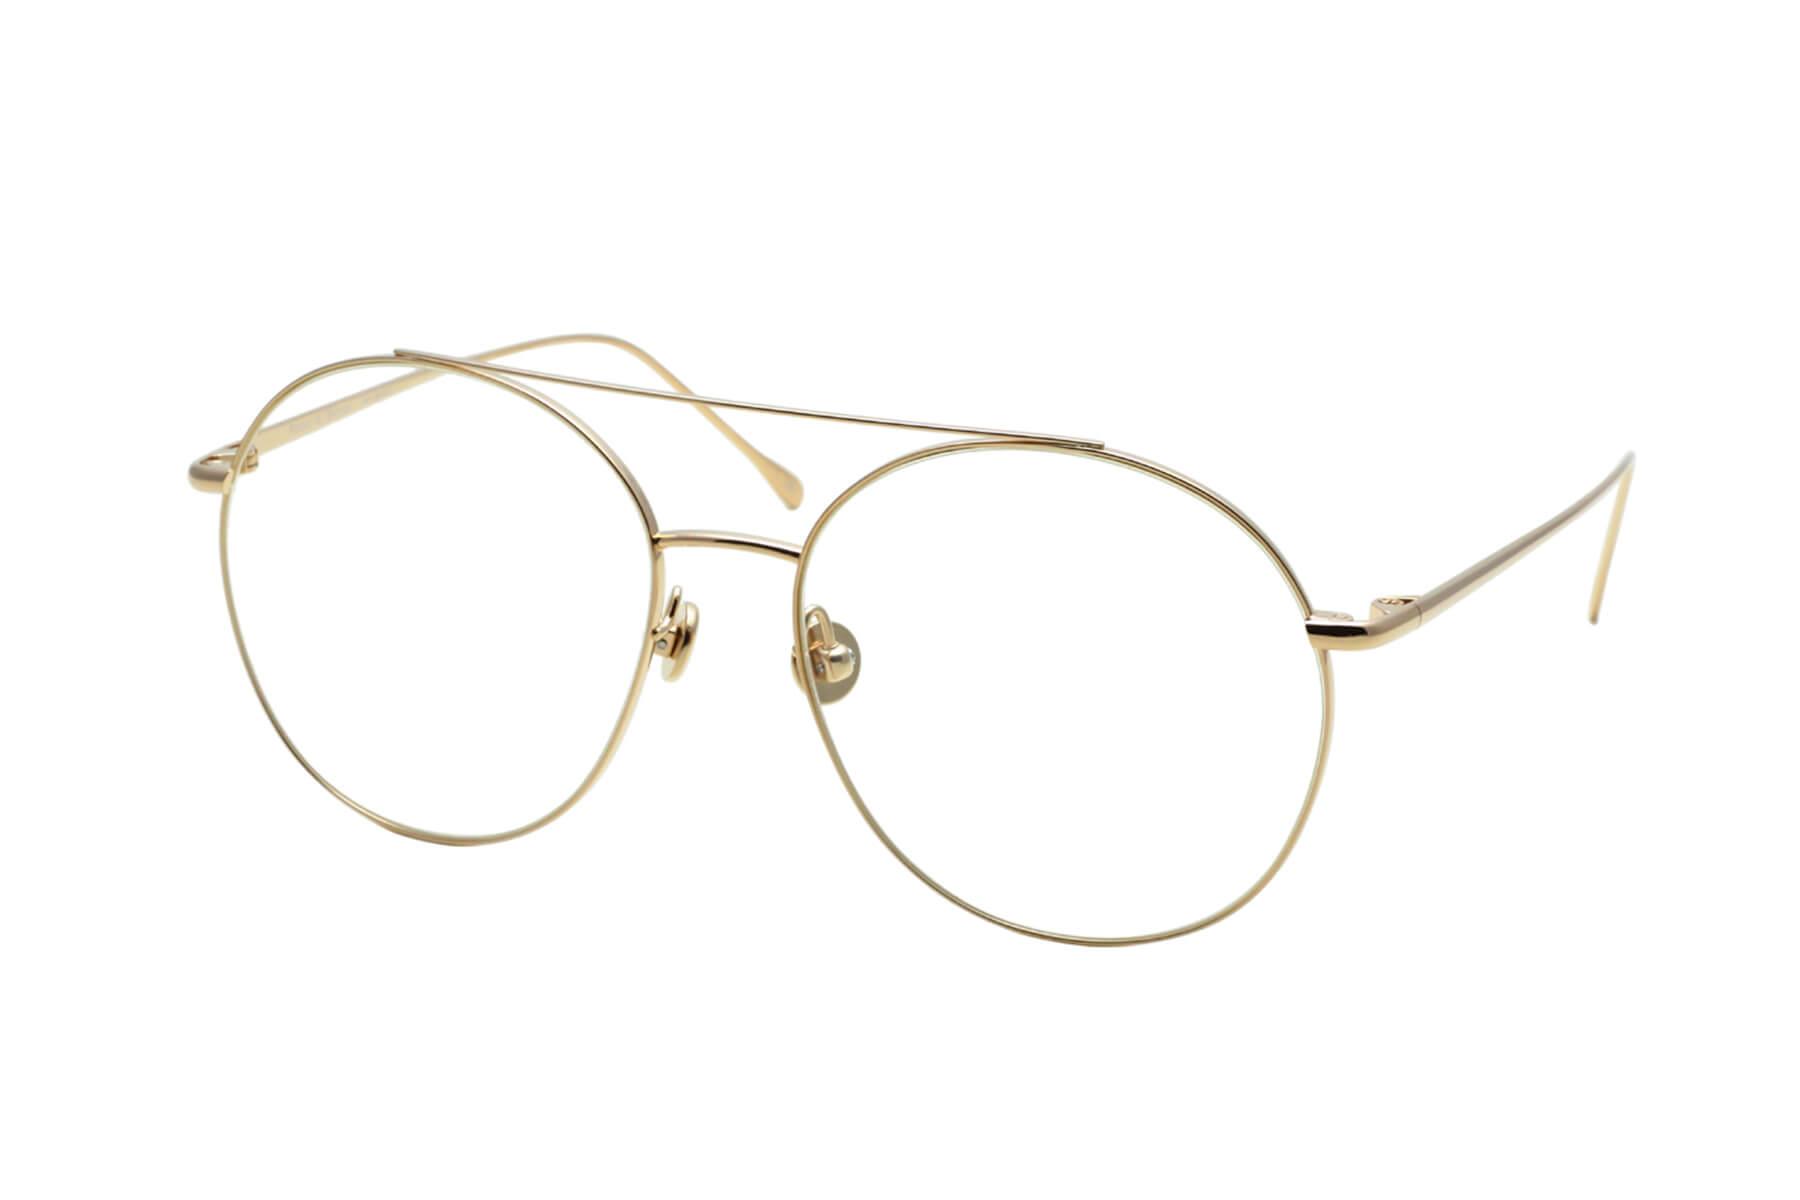 It's Life S Optical eyewear Eque.M